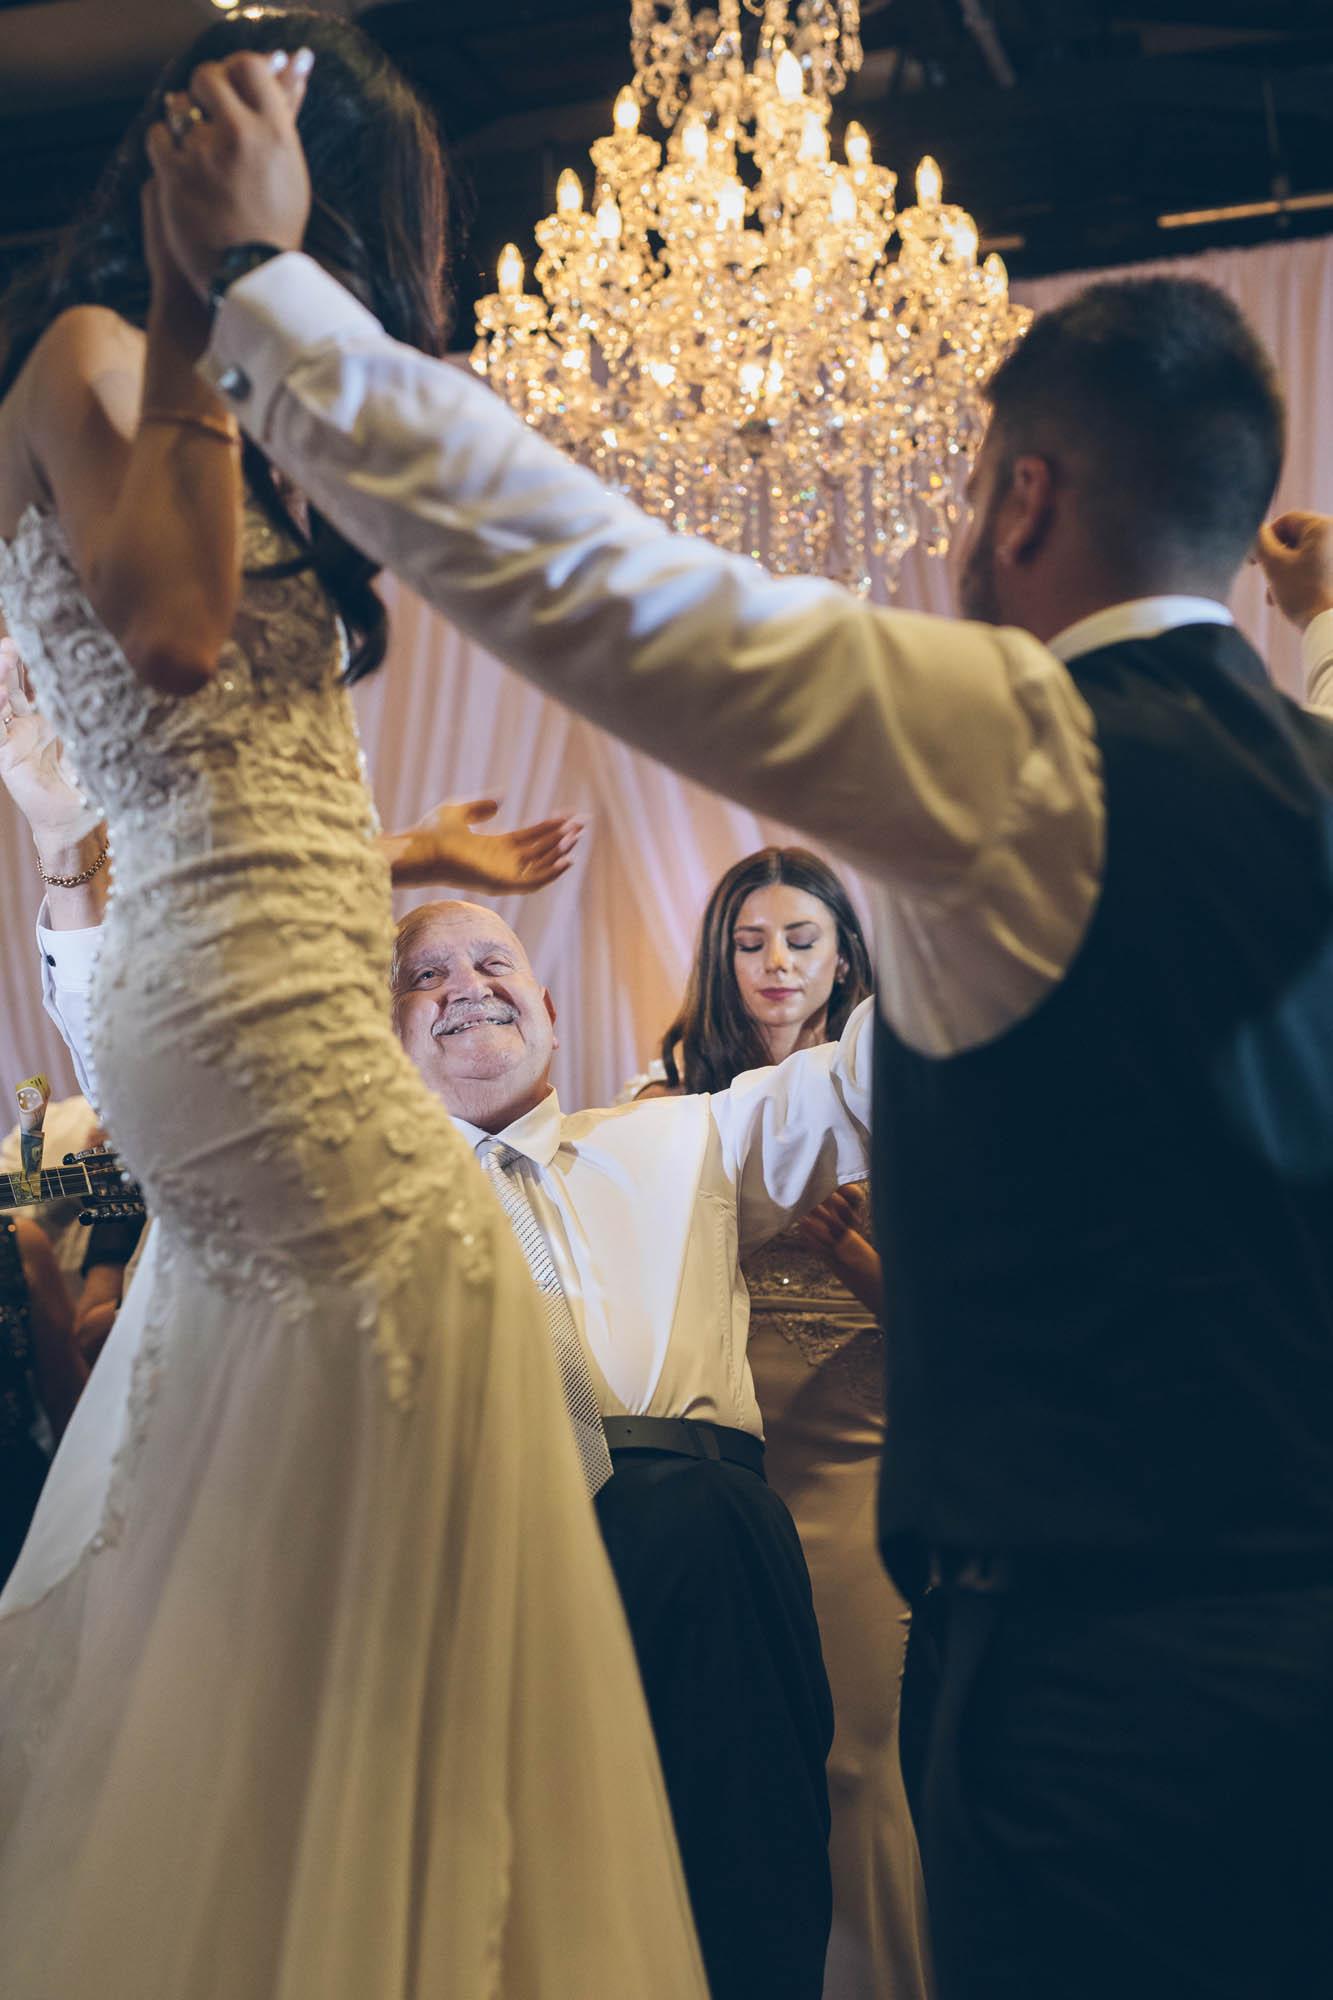 MacDougall-Photography-Sydney-Wedding-Photographers-82.jpg